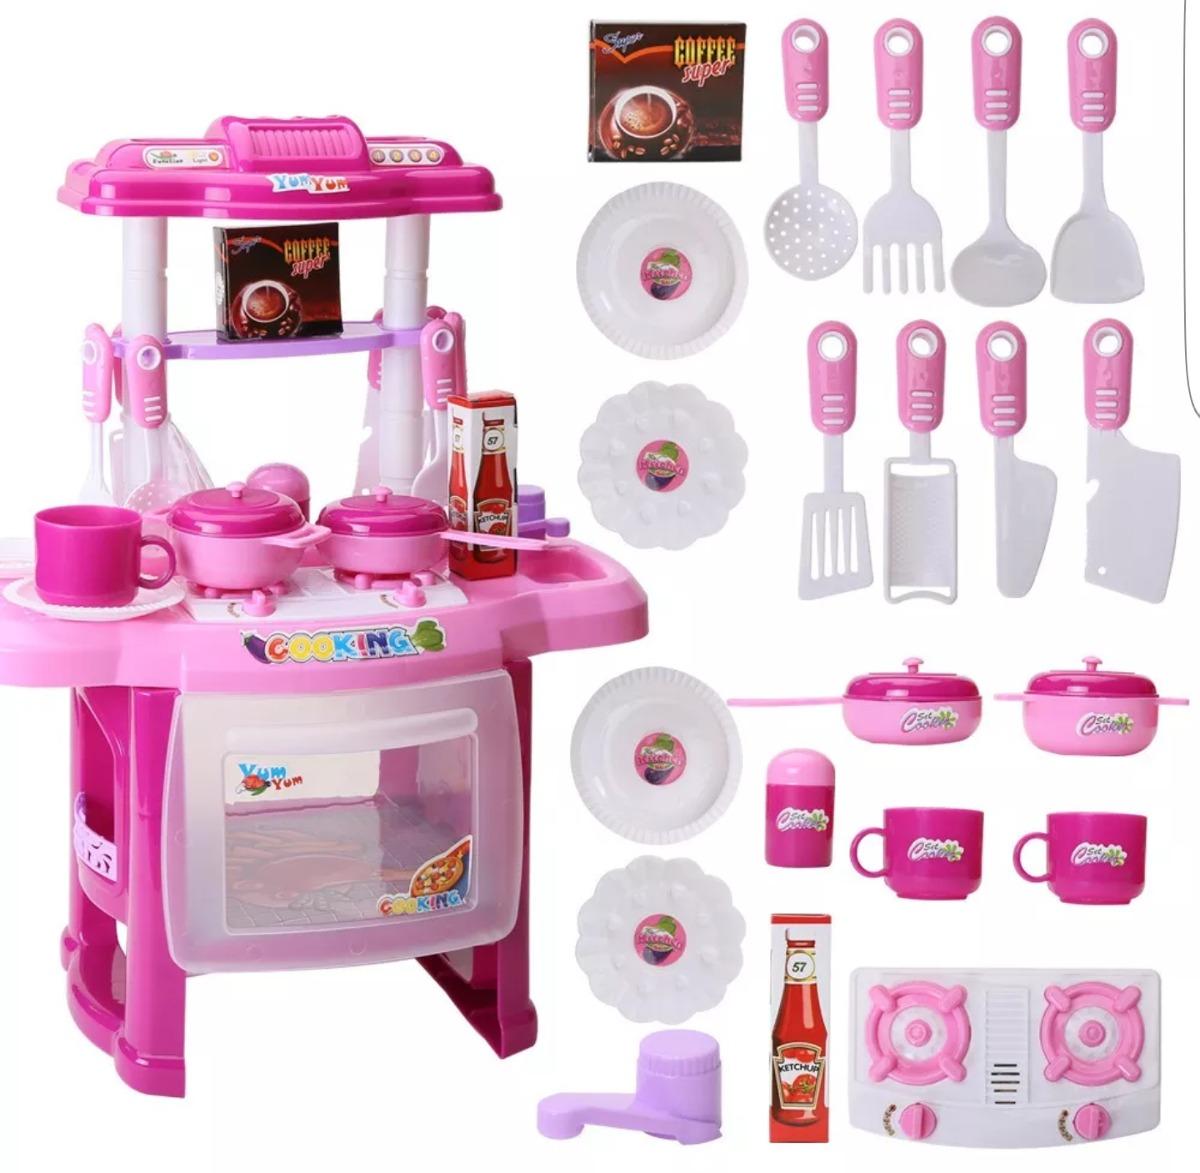 Cocina de juguete para ni as music light en - Casitas de juguete para ninas ...